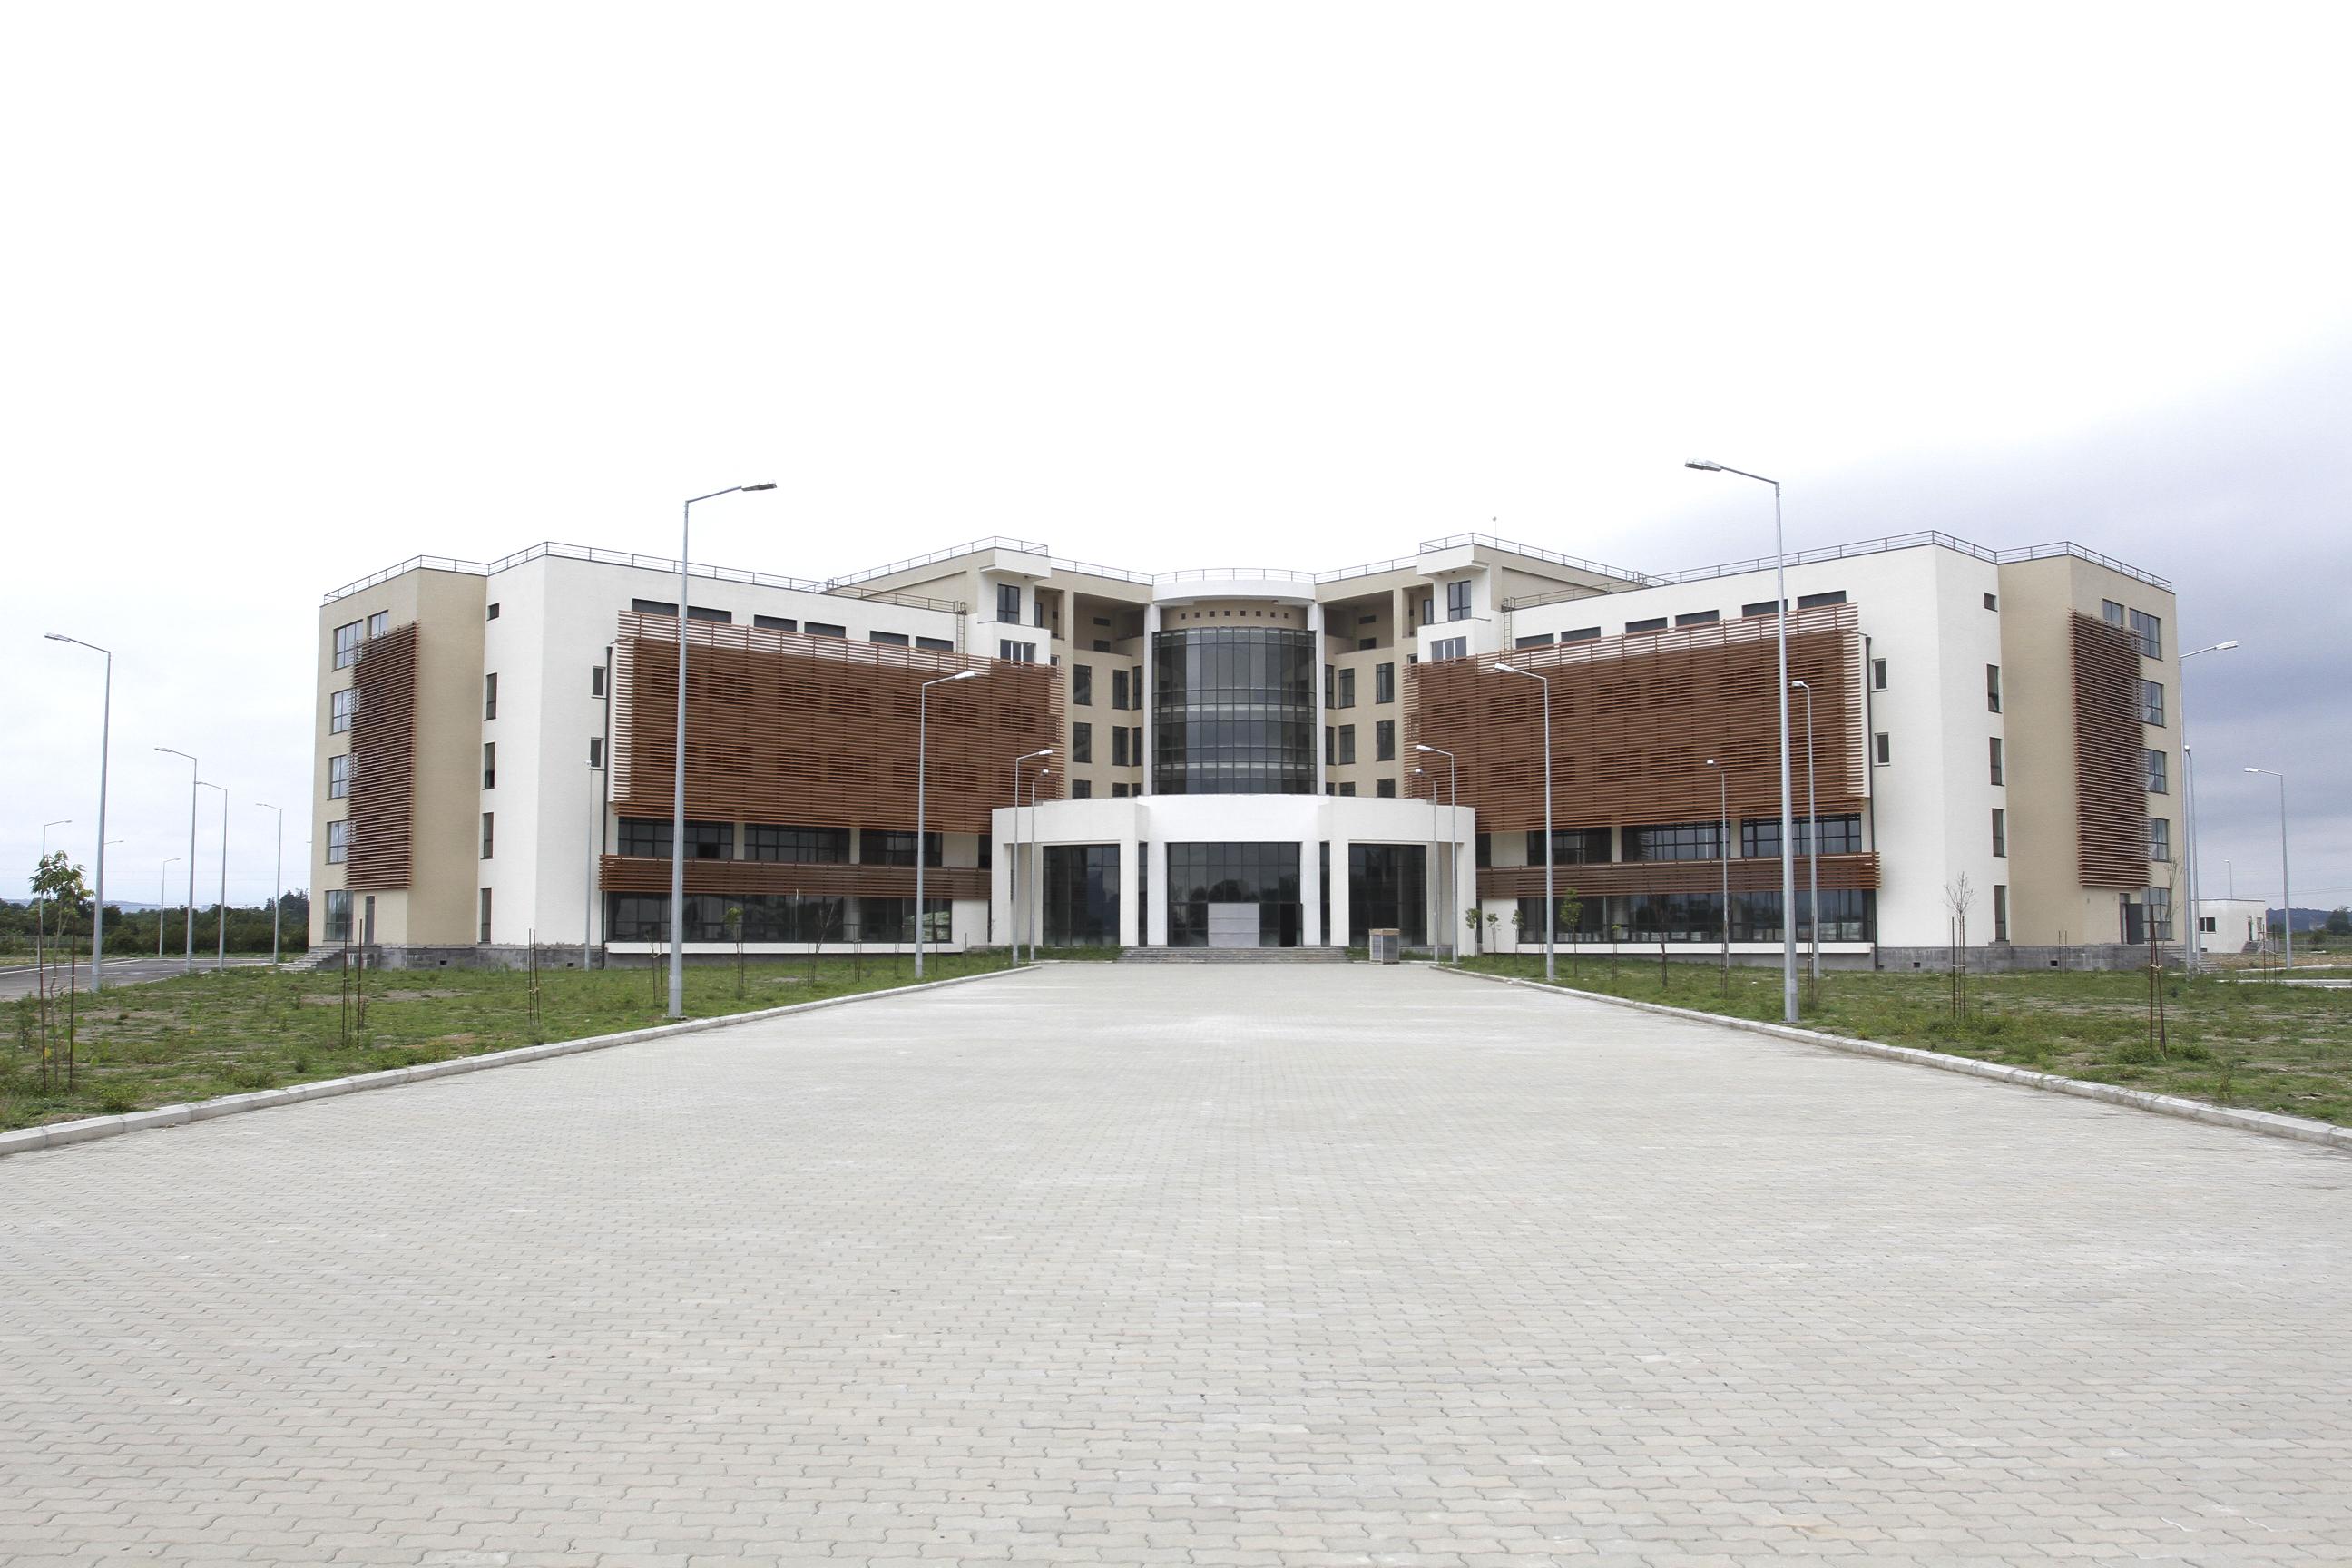 Rukhi Clinic #новости Грузия-США, клиника Рухи, Рухи, сша